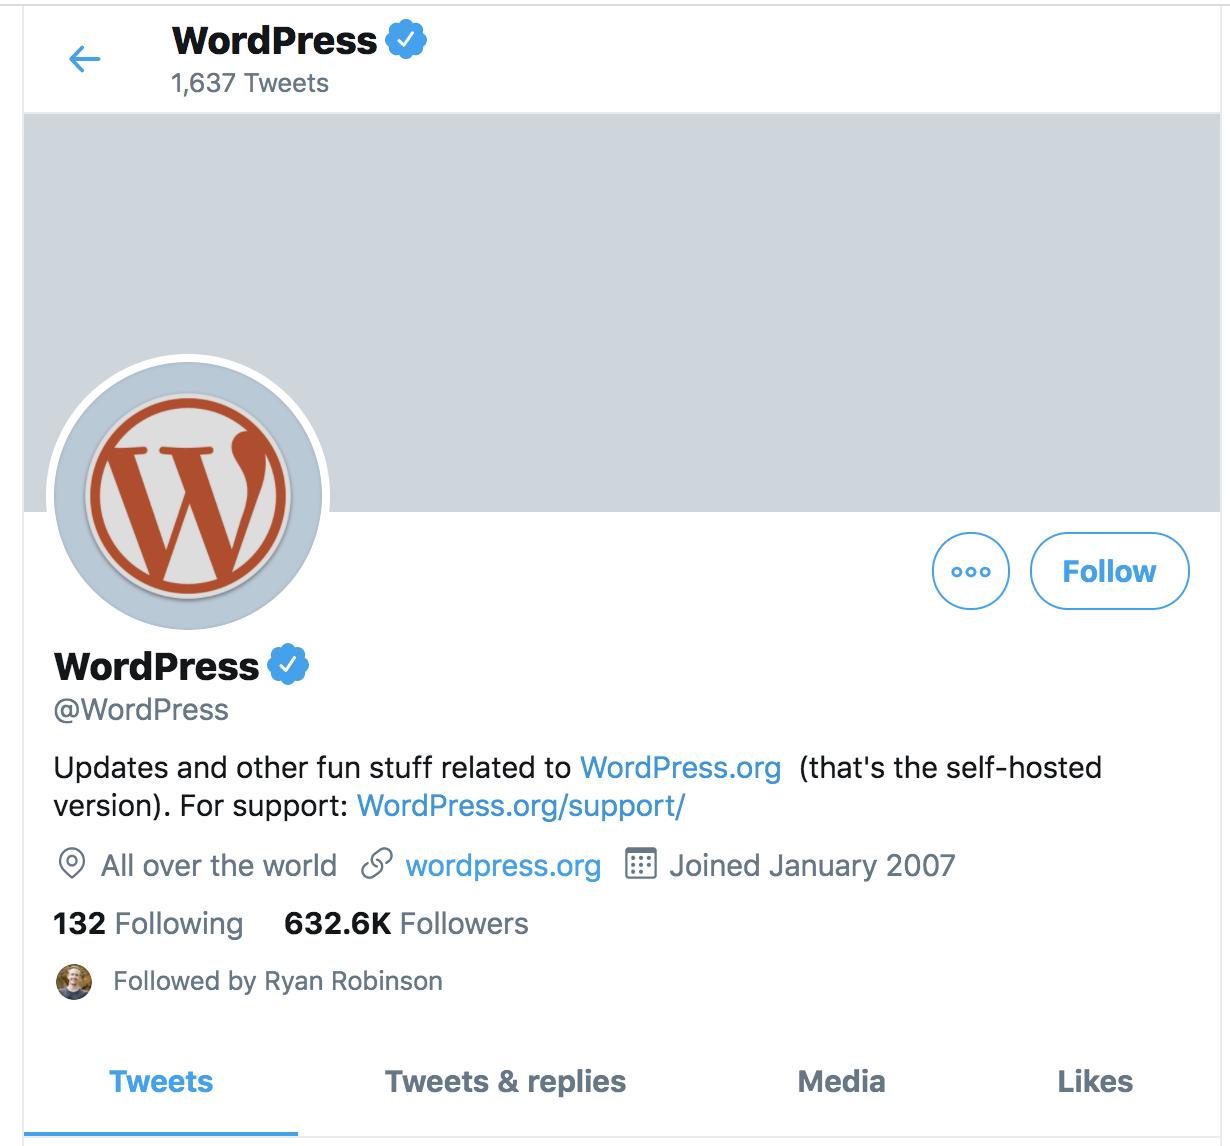 Screenshot of WordPress Twitter Account (Example of Using Twitter Lists)